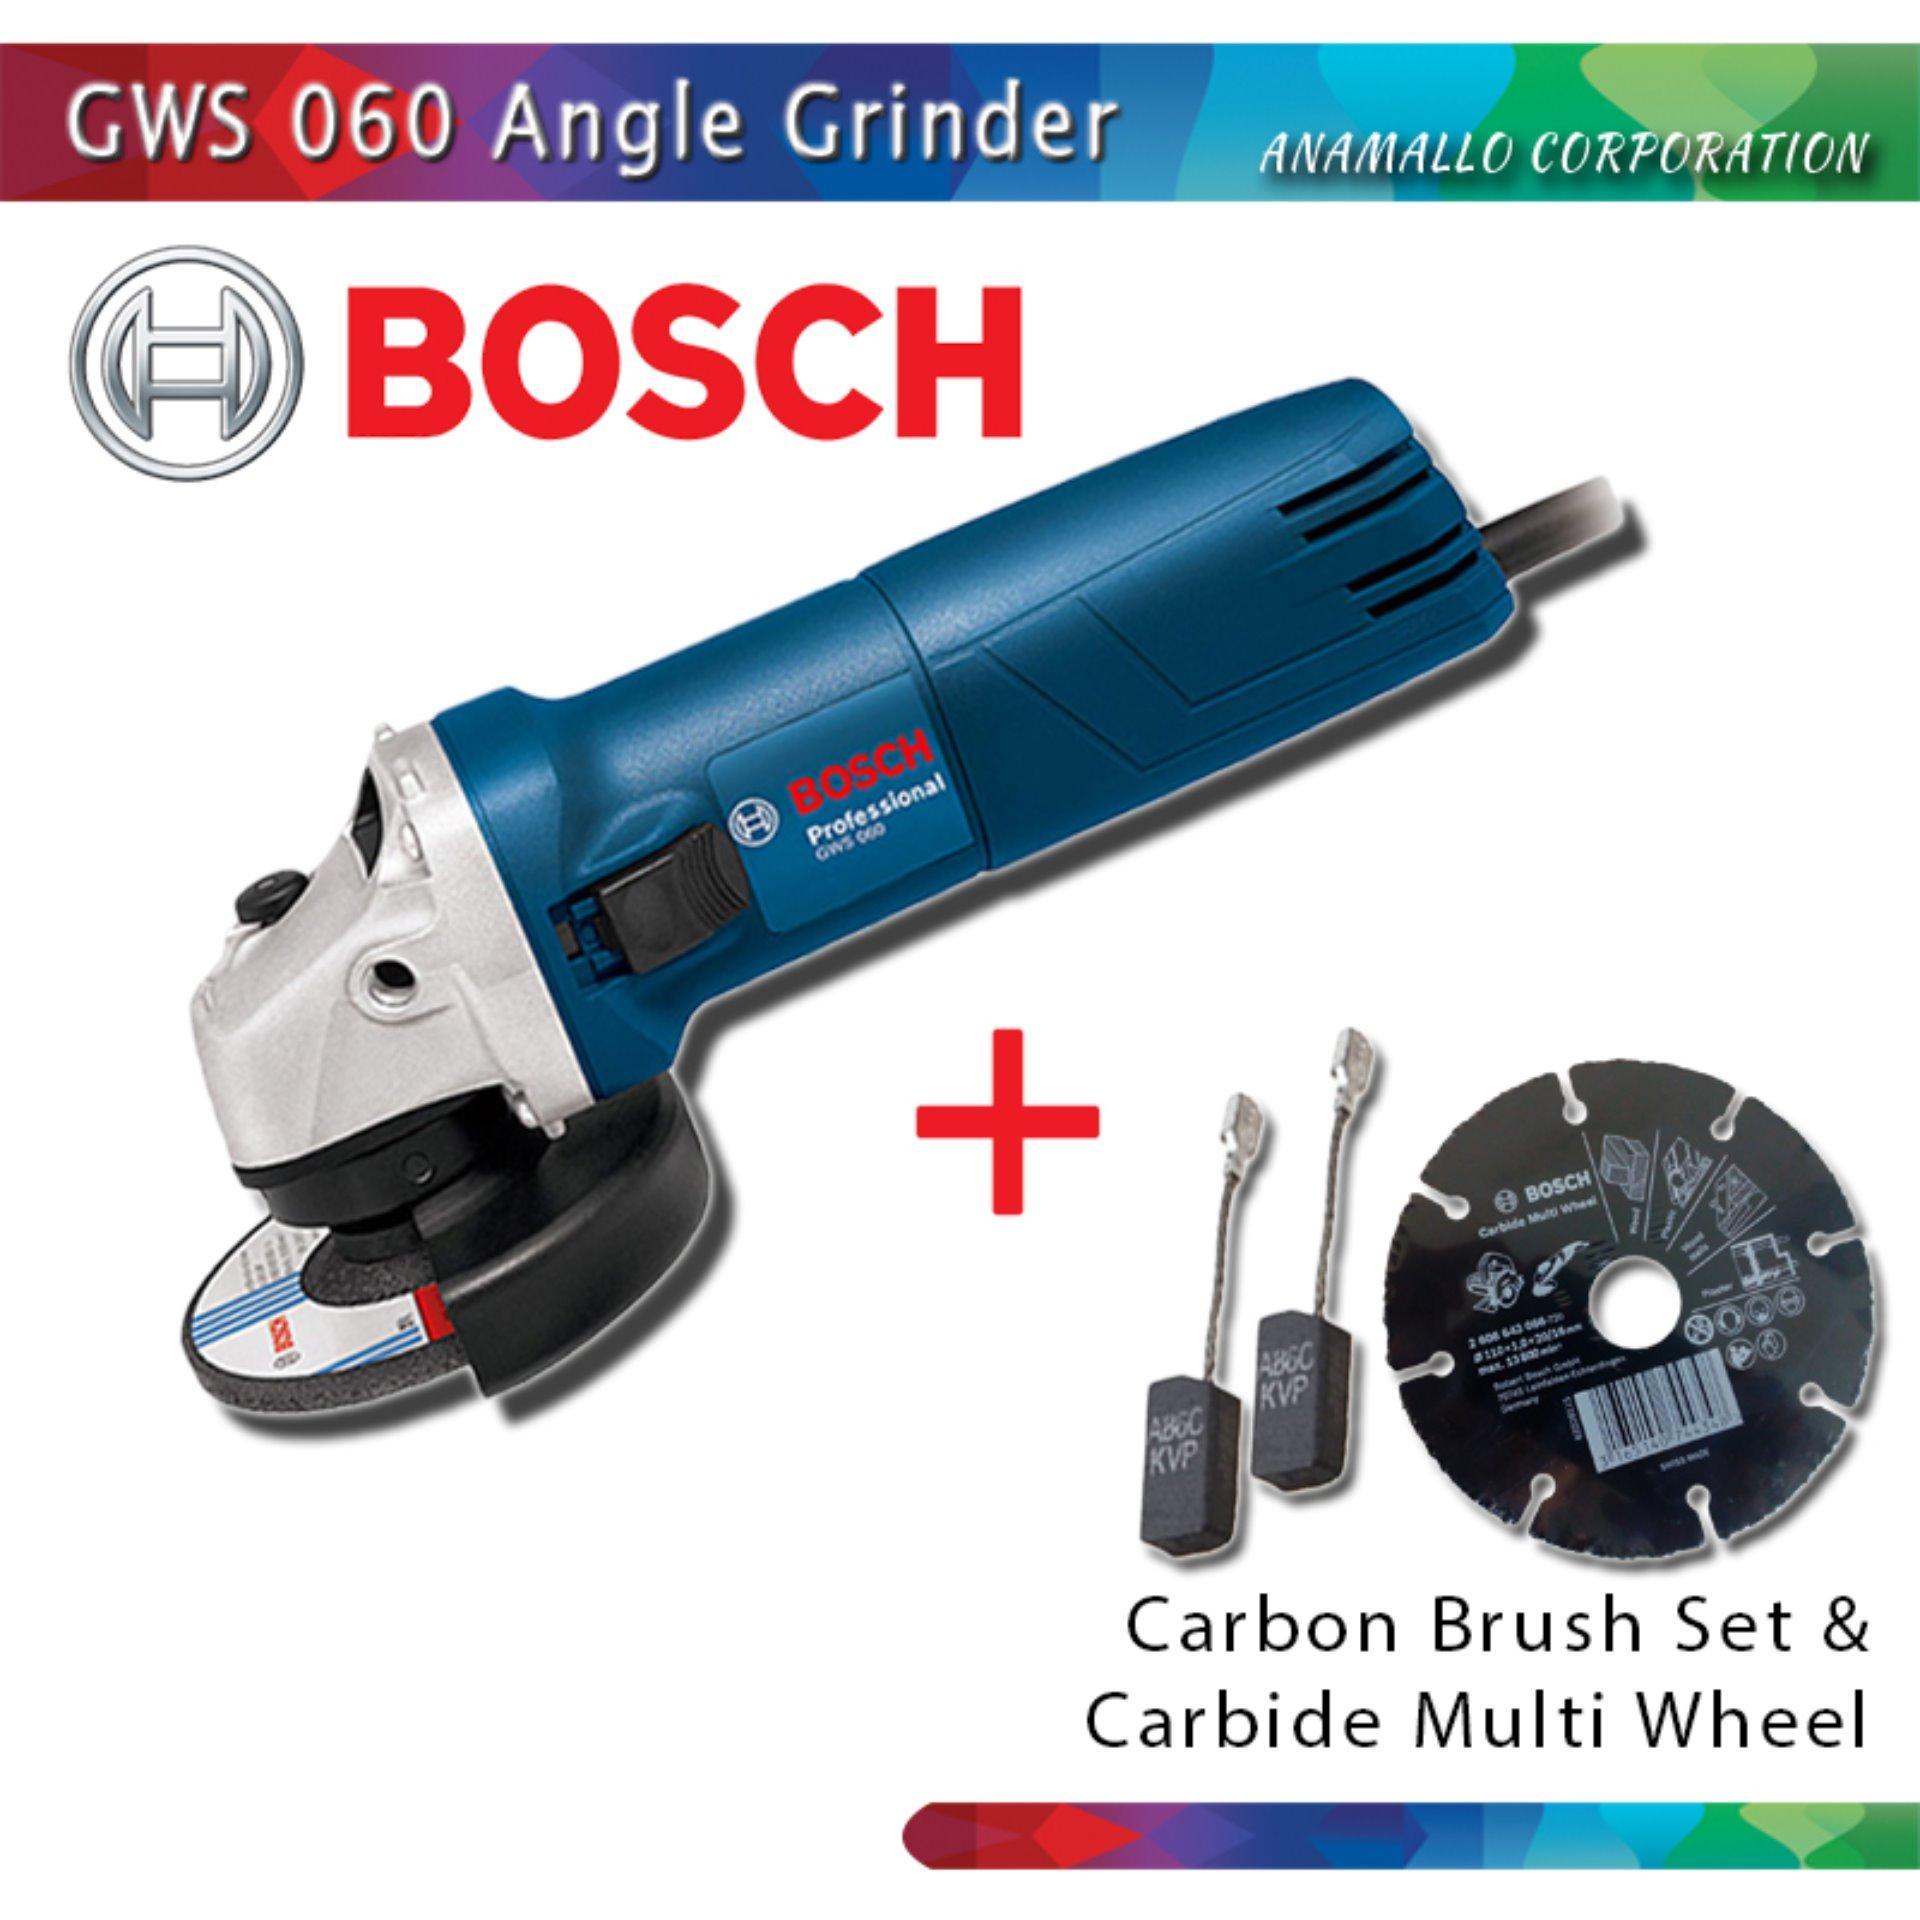 BOSCH GWS 060 Angle Grinder w/ Carbon Brush Set & Carbide .